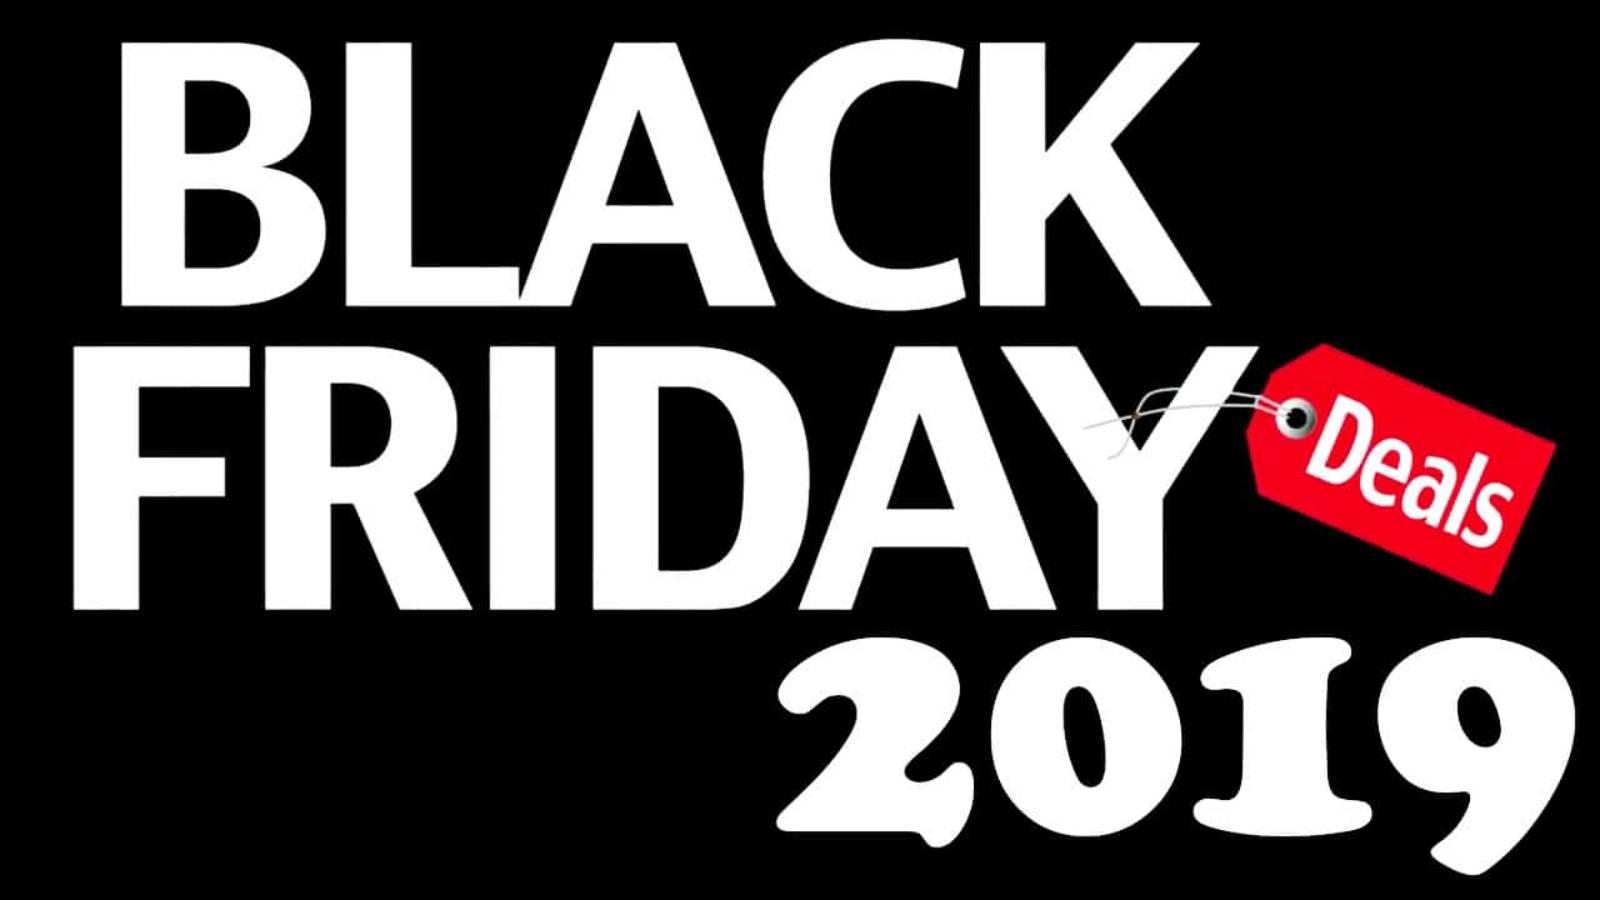 BLACK FRIDAY 2019 saptamana clienti romani